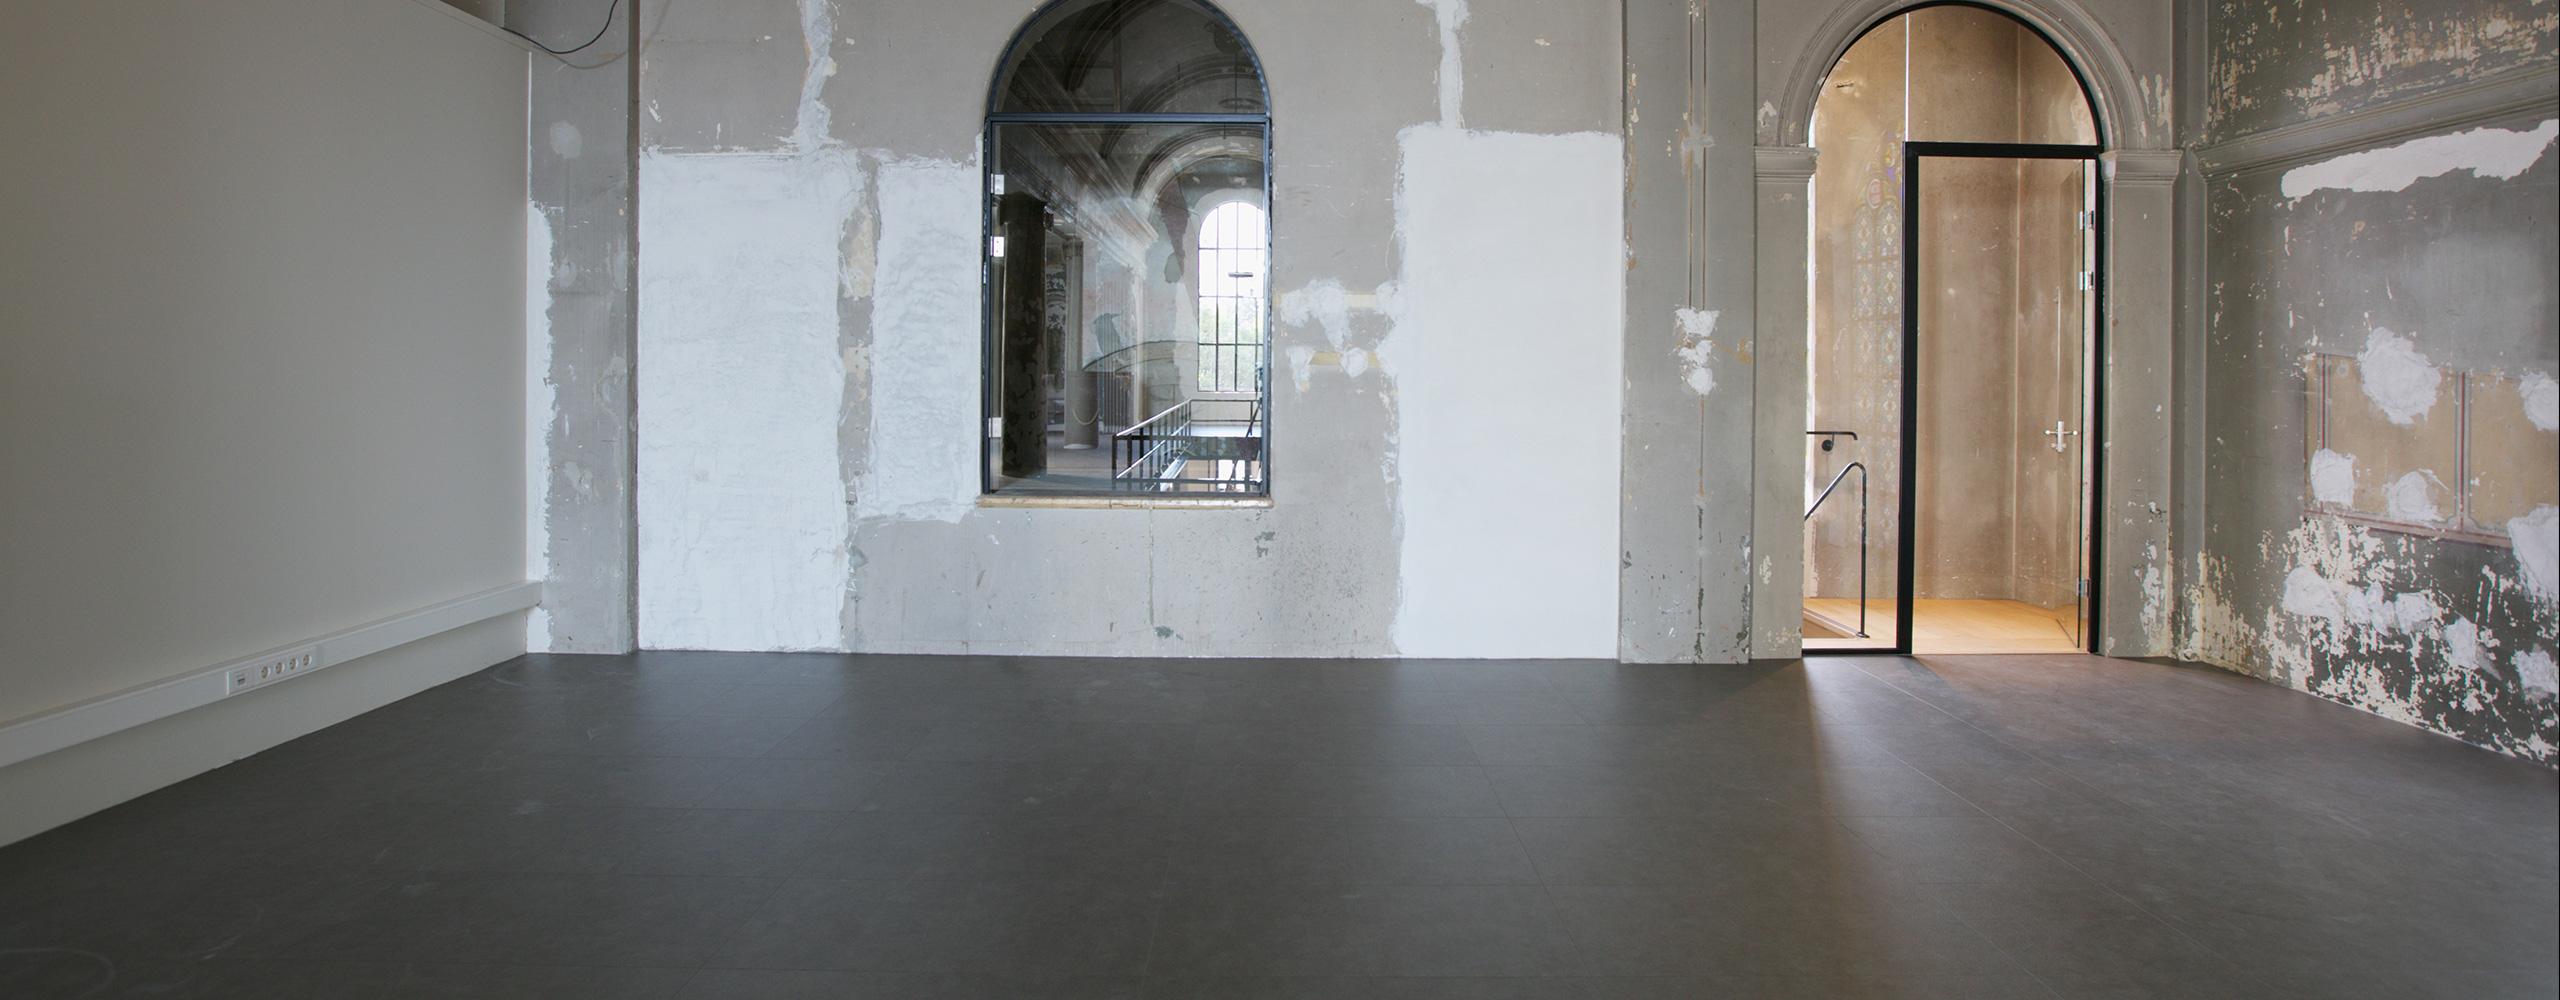 Blokkerk Studio